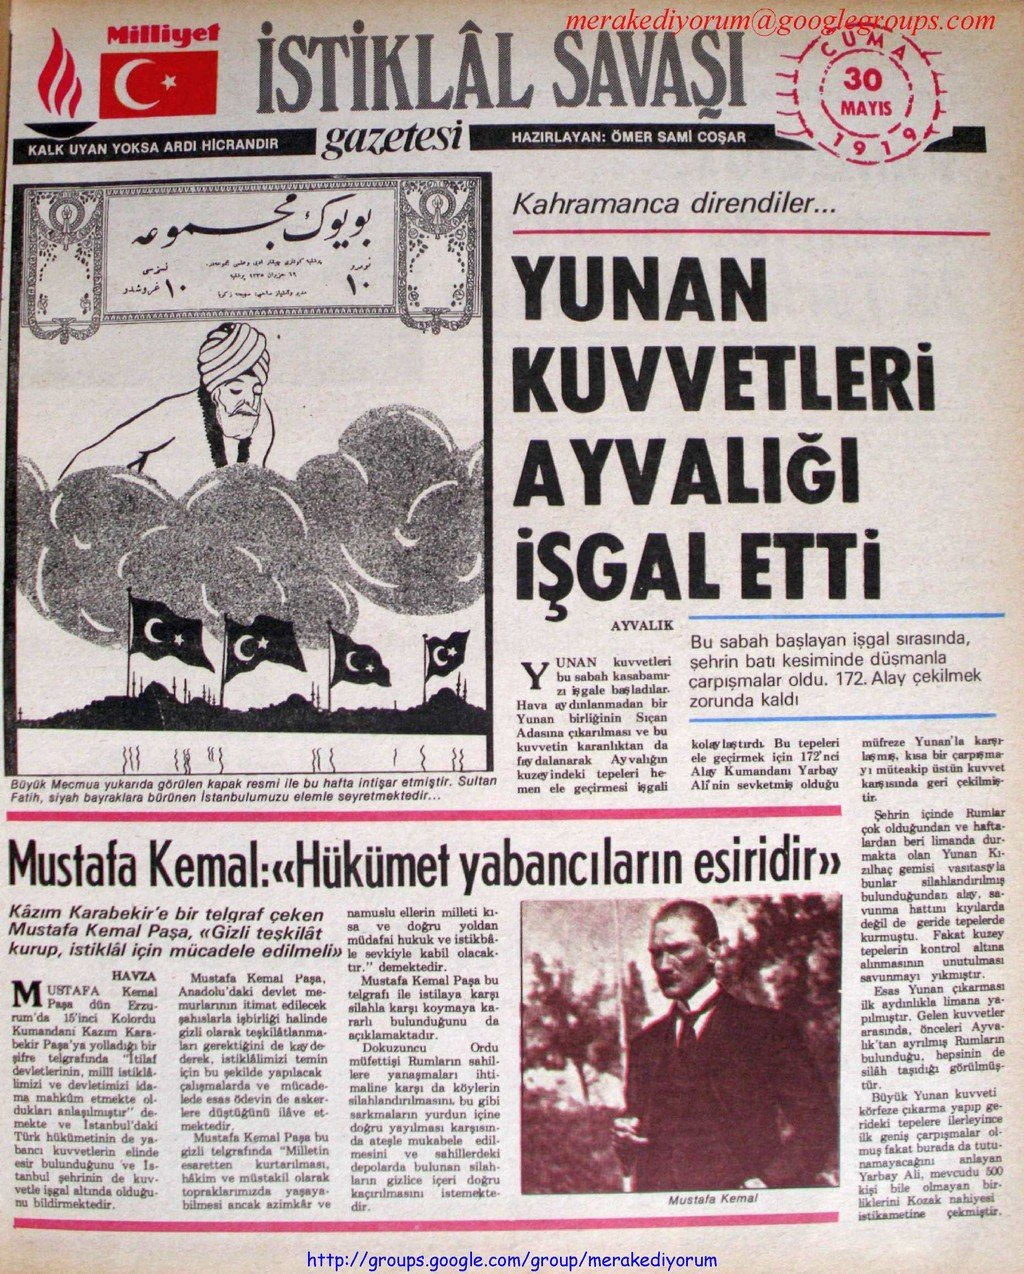 istiklal savaşı gazetesi - 30 mayıs 1919